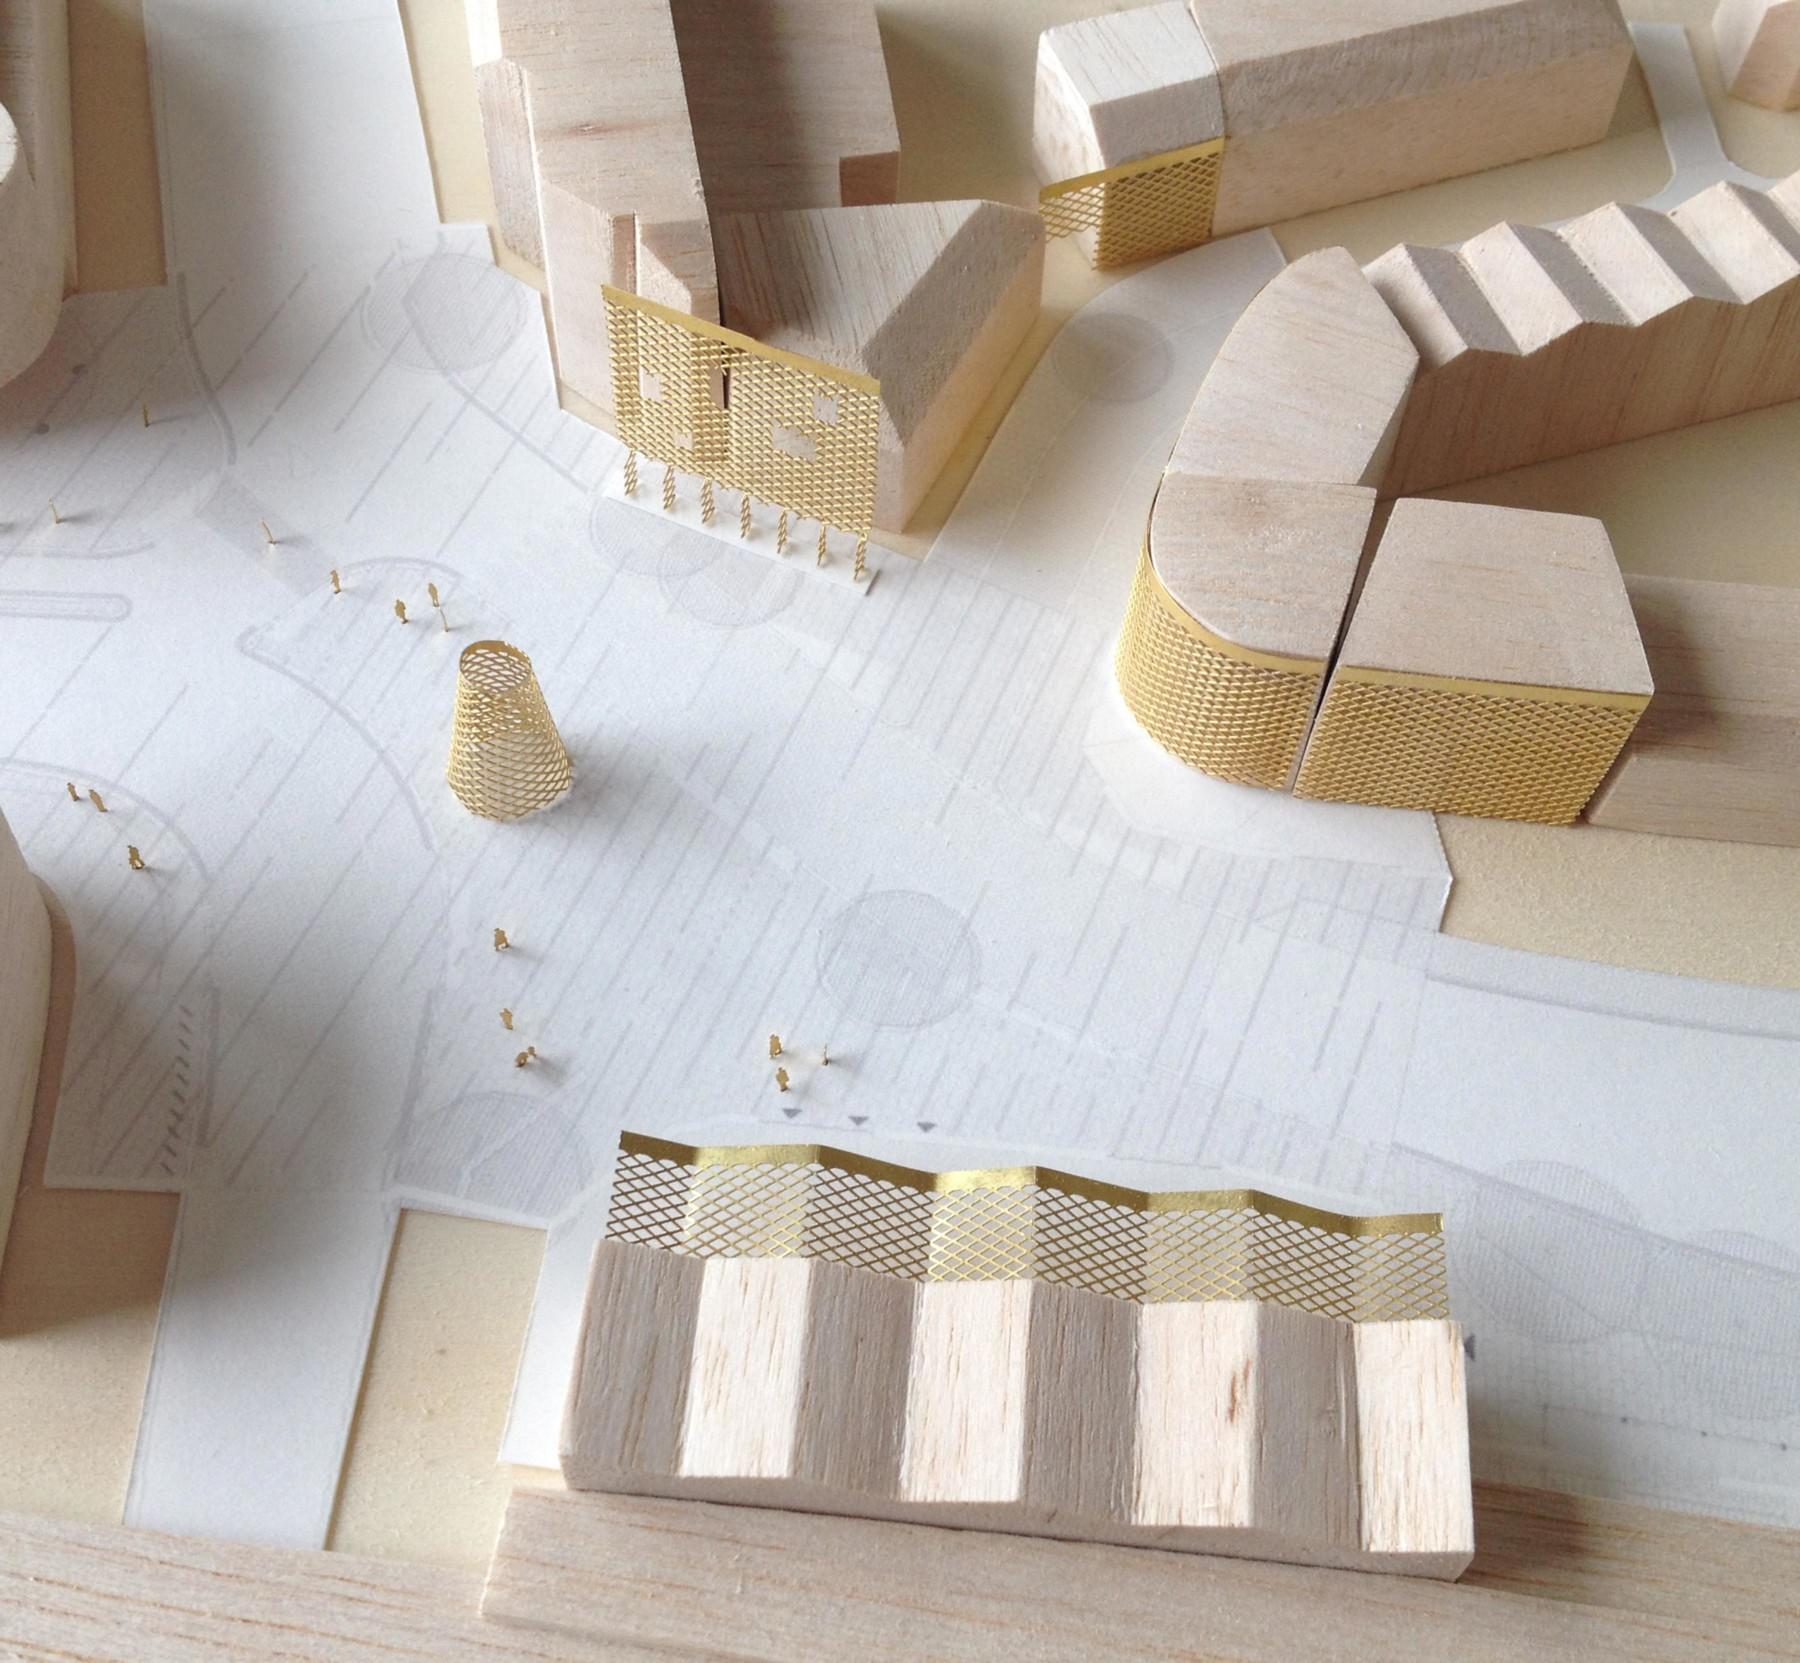 Sarah-Wigglesworth-Architects Kingston-Mini-Holland Context Model 3600